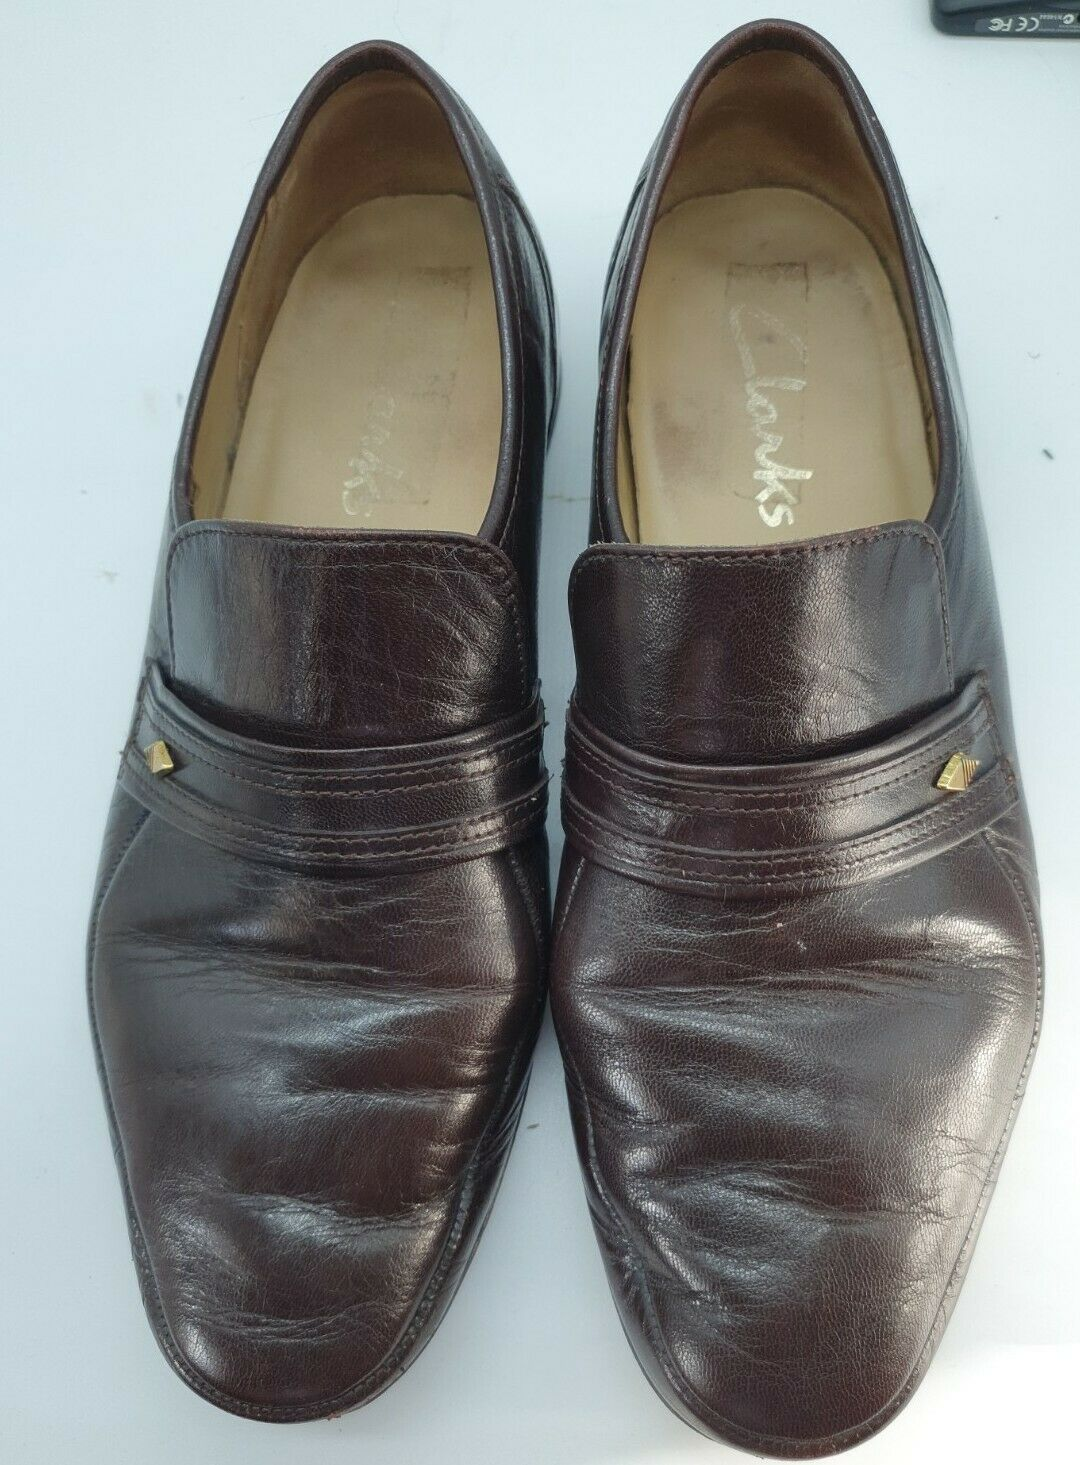 CLARKS MENS DARK BROWN LEATHER SLIP-ON LOAFERS SHOES SIZE 9 Vintage